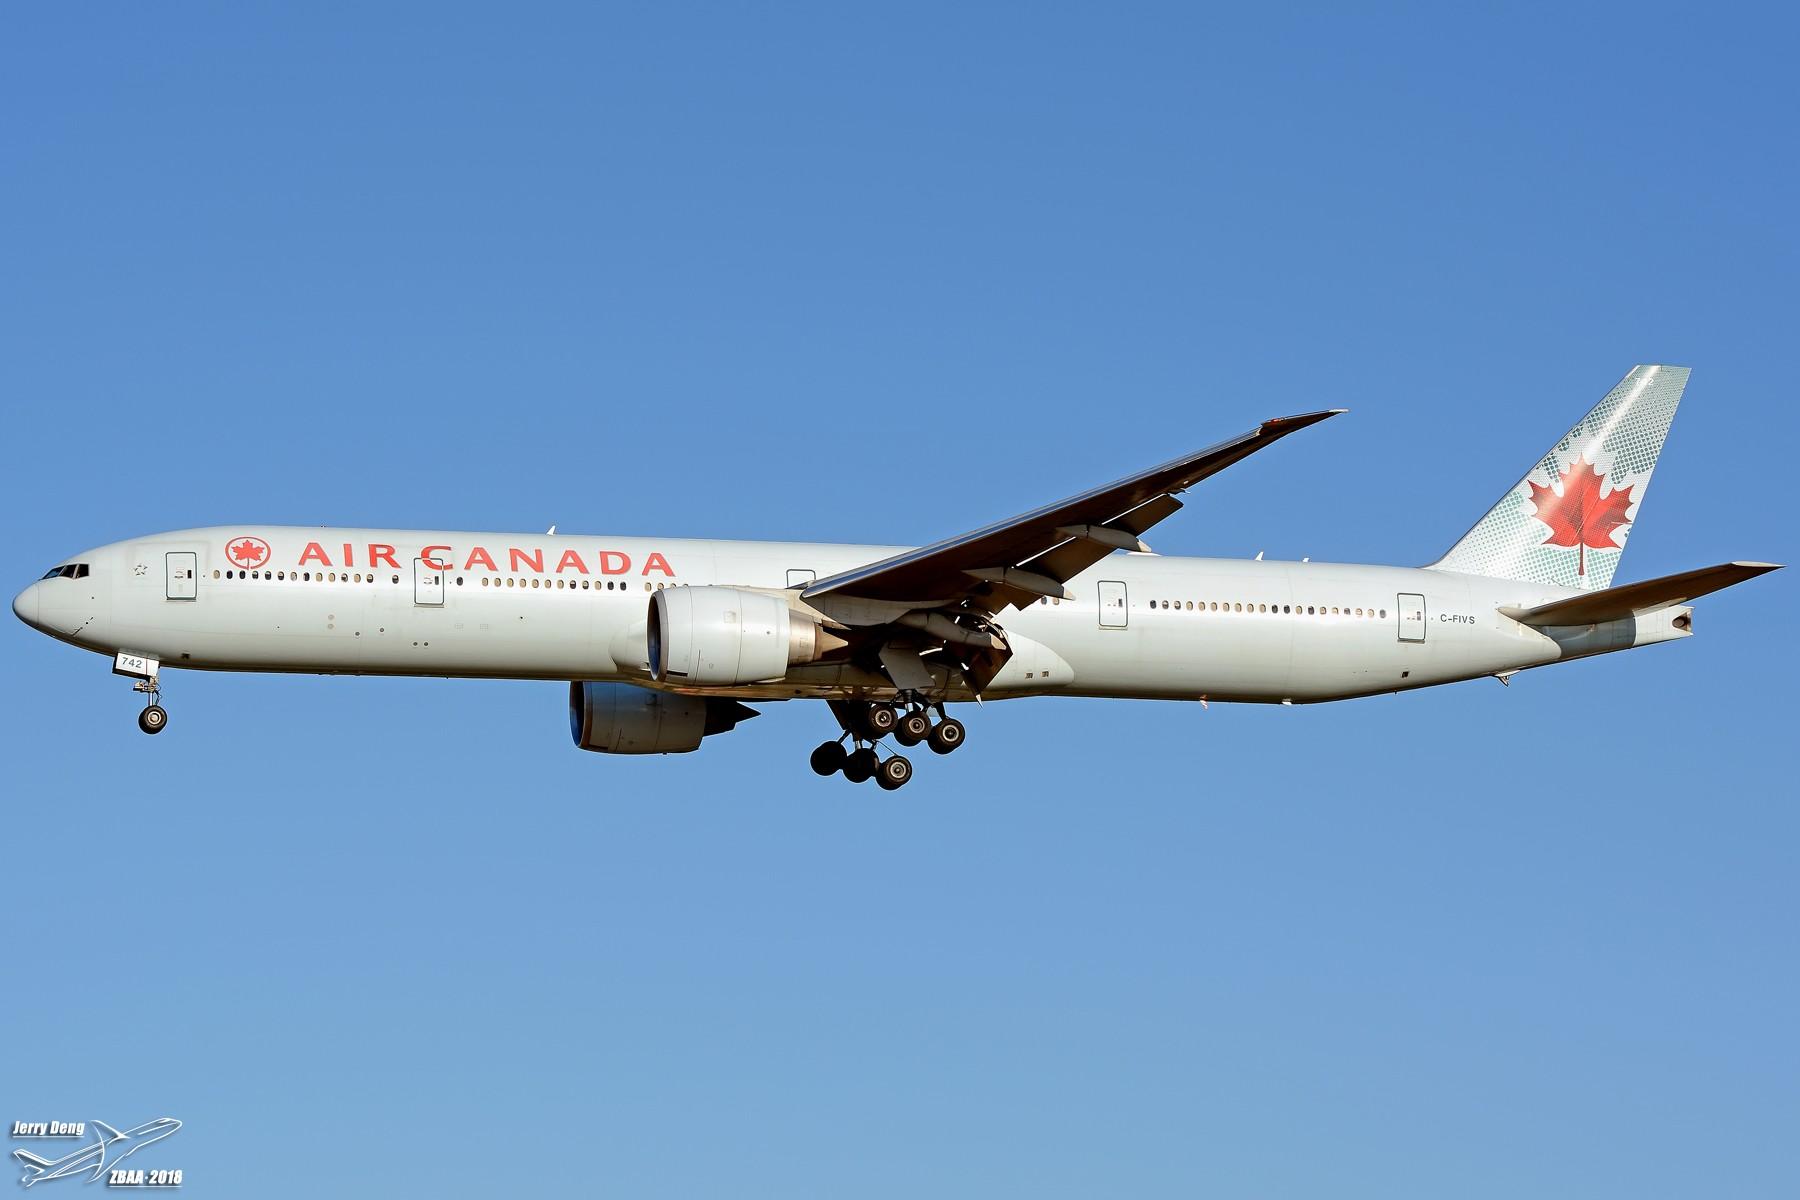 Re:[原创]【多图党】出差赶上天气不错ZBAA随拍 BOEING 777-300ER C-FIVS 中国北京首都国际机场